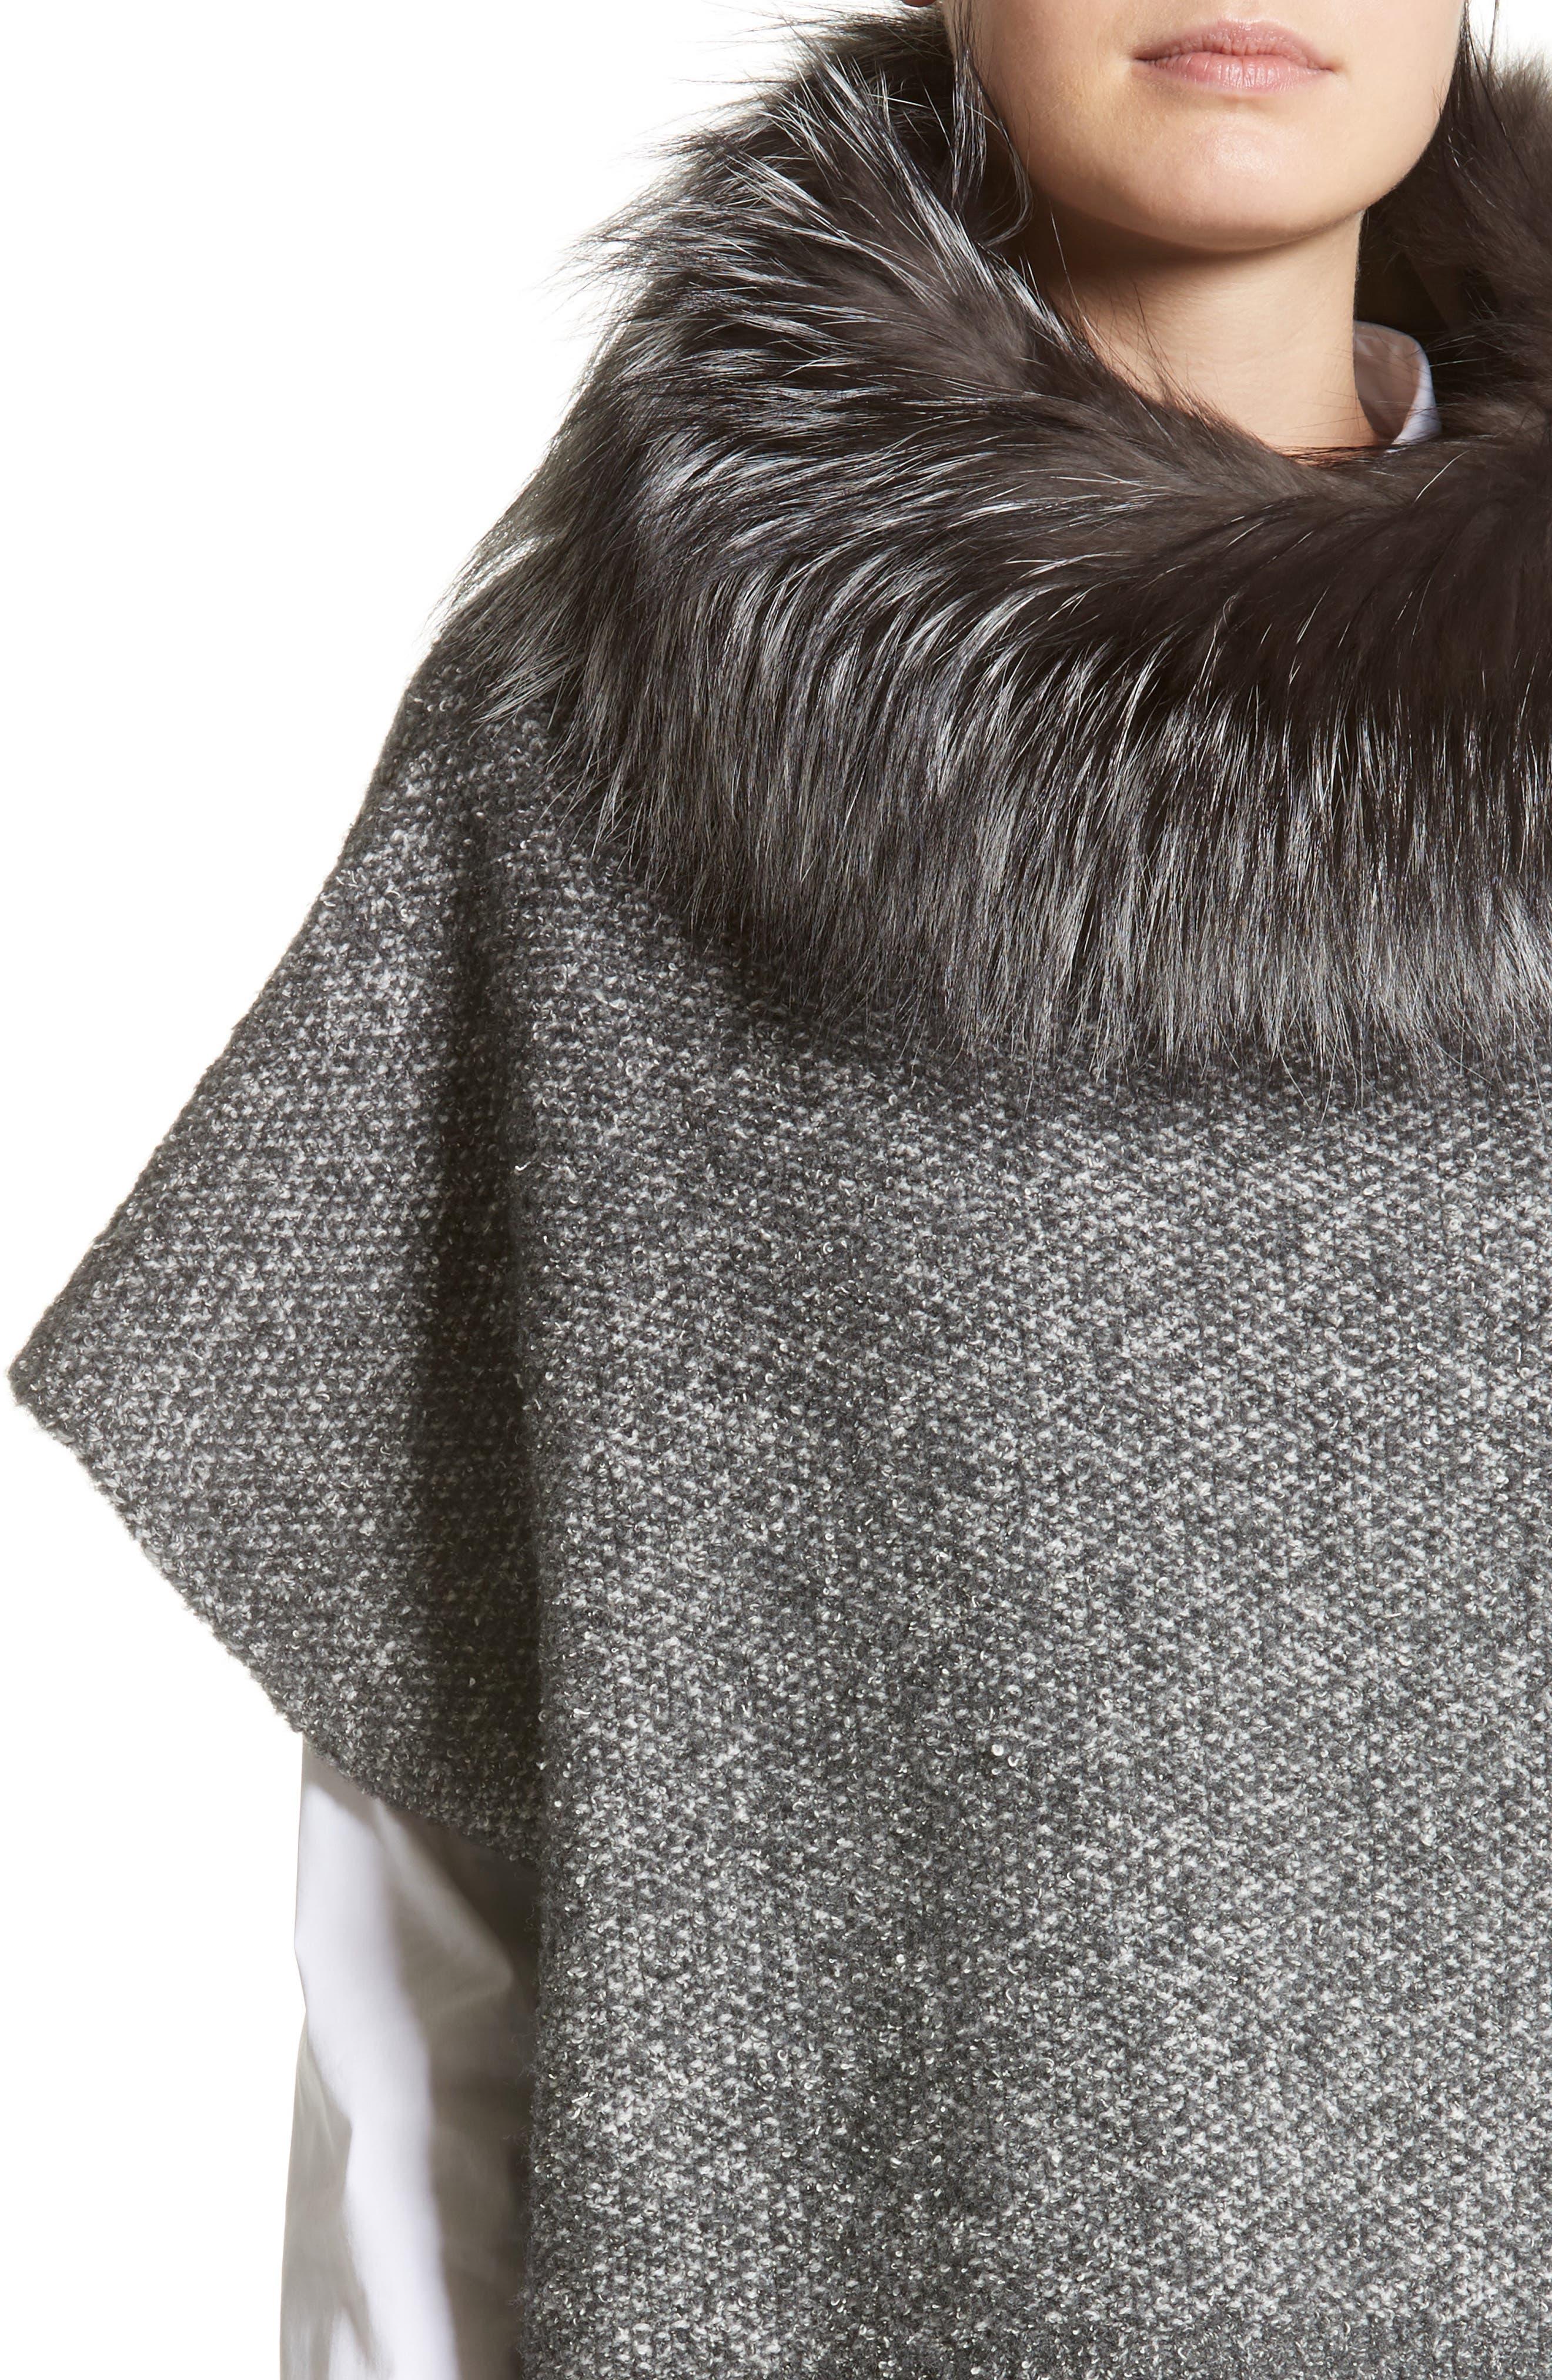 Pebble Tweed Knit Poncho with Genuine Fox Fur Collar,                             Alternate thumbnail 7, color,                             Grey Multi